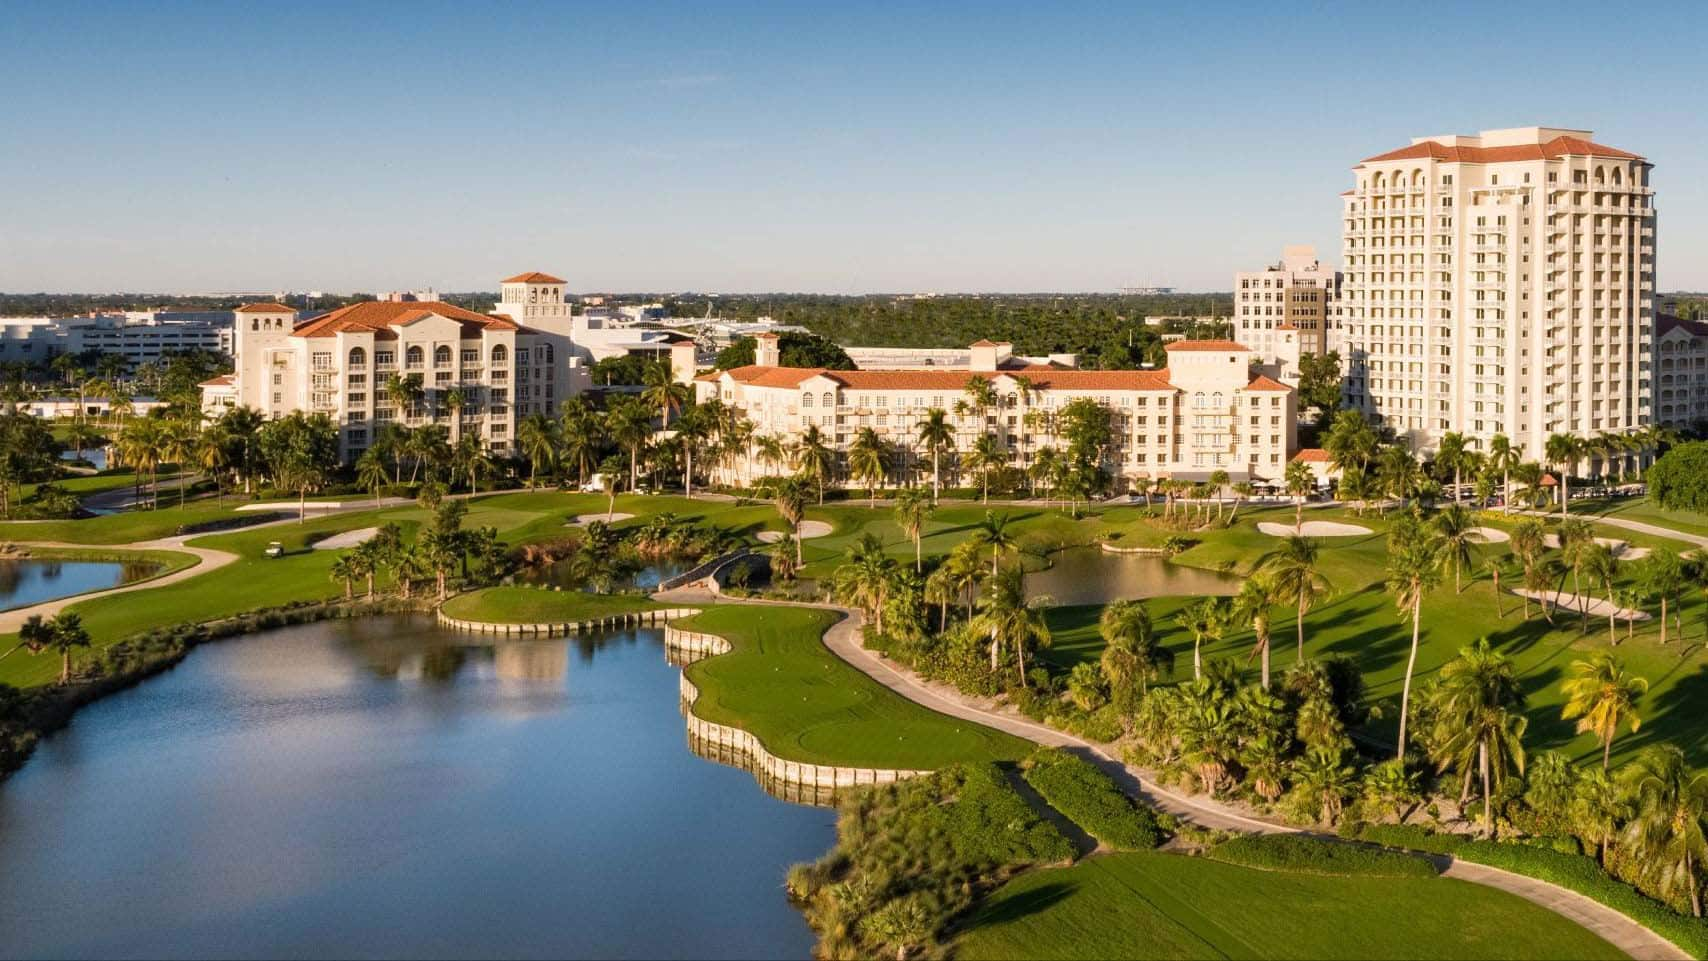 Senior Living 100 event banner showing JW Marriott in Miami, FL